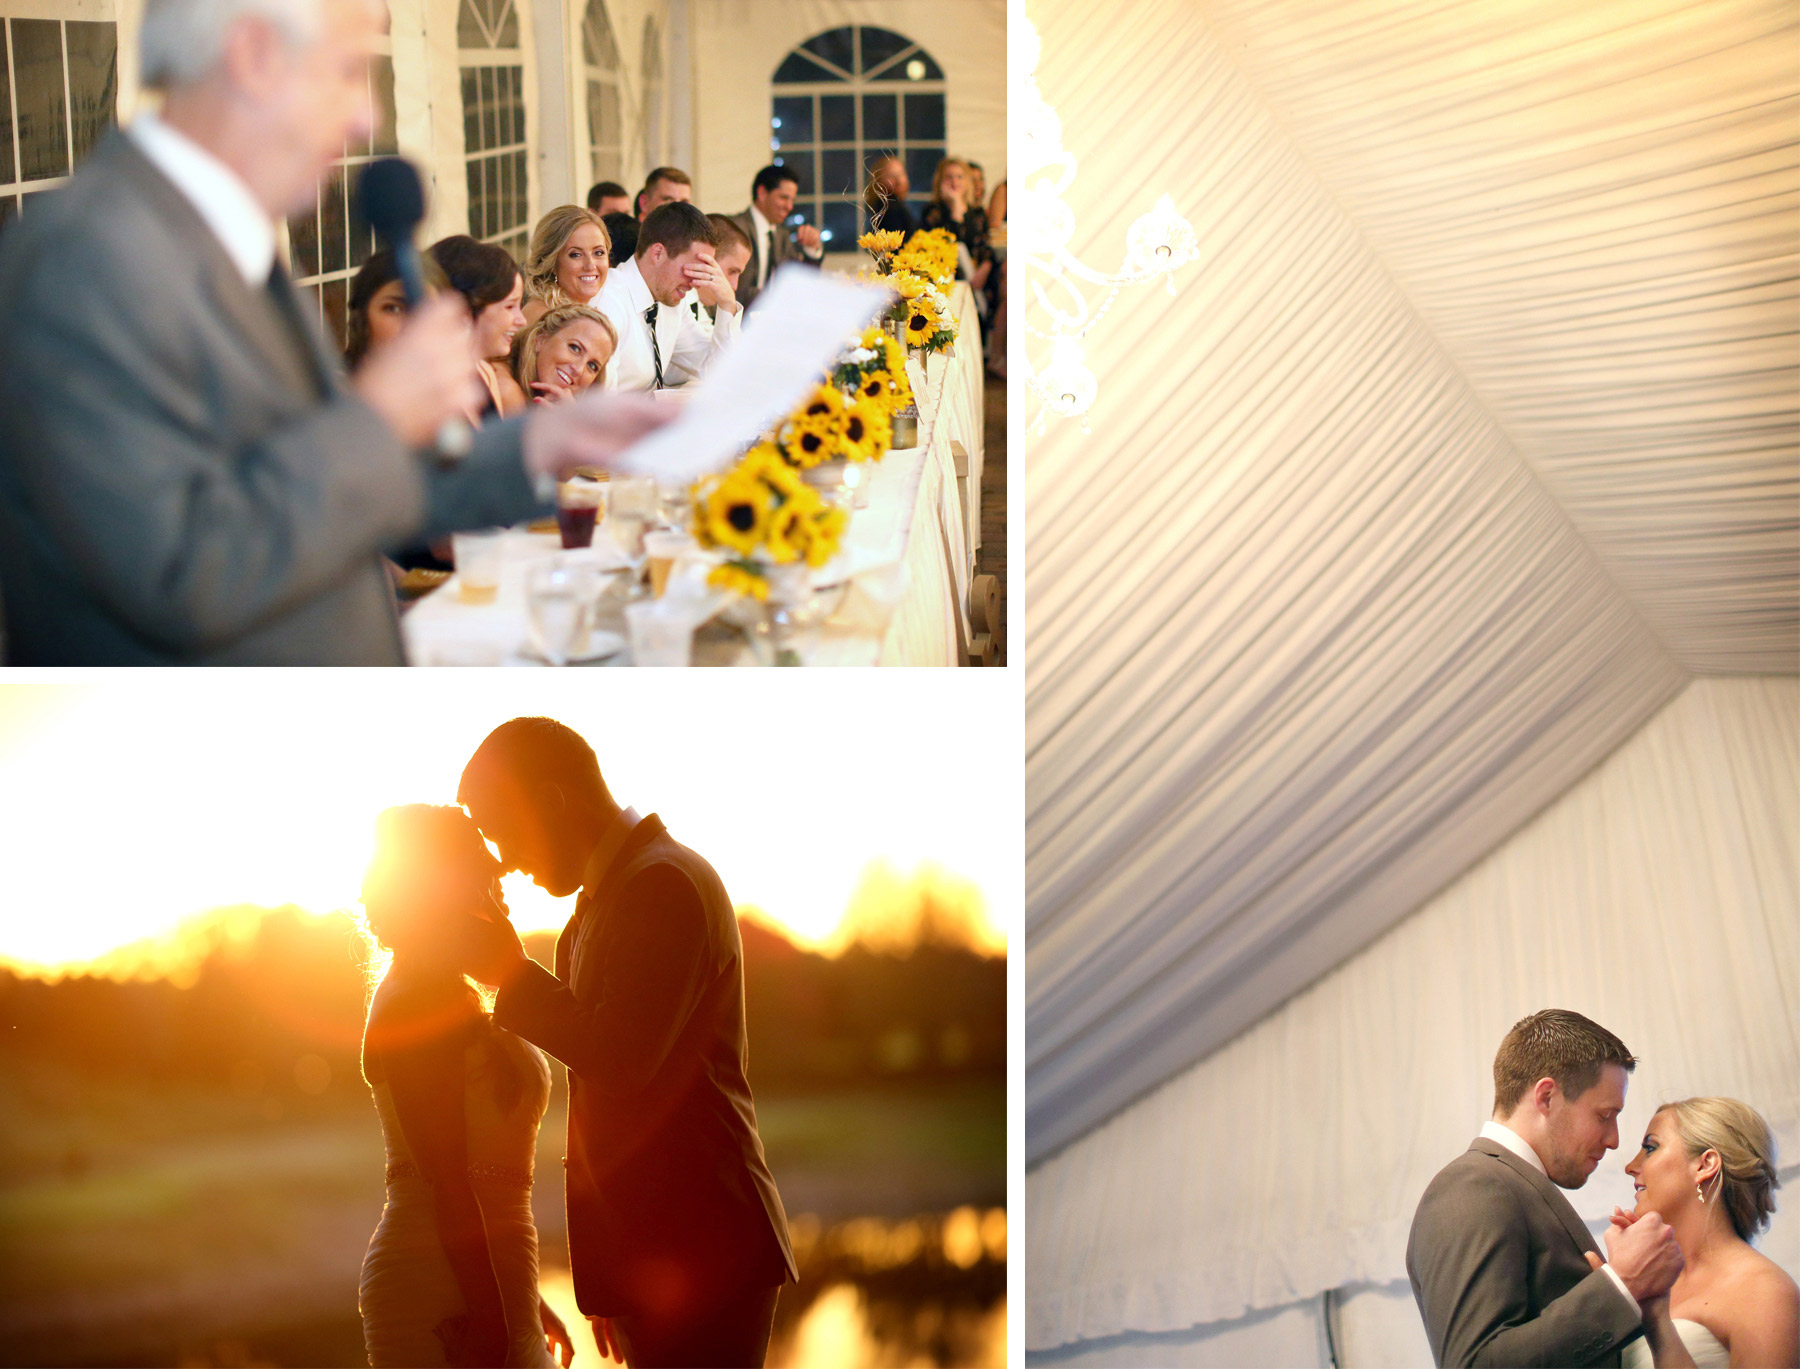 21-Stillwater-Minnesota-Wedding-Photographer-by-Andrew-Vick-Photography-Fall-Autumn-StoneRidge-Golf-Club-Bride-Groom-Father-Parents-Laughter-Speeches-Sunset-Sunflare-Dance-Micaela-and-Derek.jpg